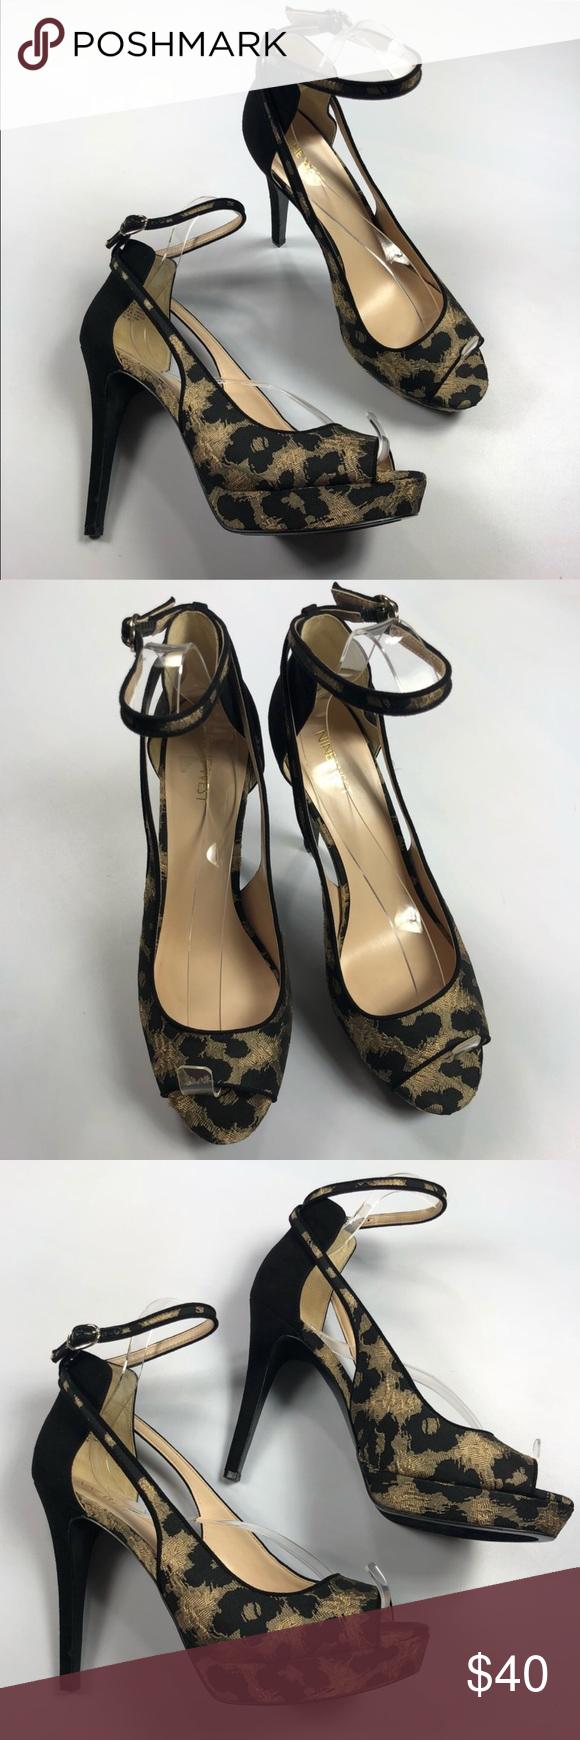 NWOT Nine West  Size 10 Cheetah Print Heels NWOT Gorgeous cheetah /leopard print heels. Aprox 4.5 inches. Strap with buckle, peep toe heel. Brand new, tags removed. Nine West Shoes Heels